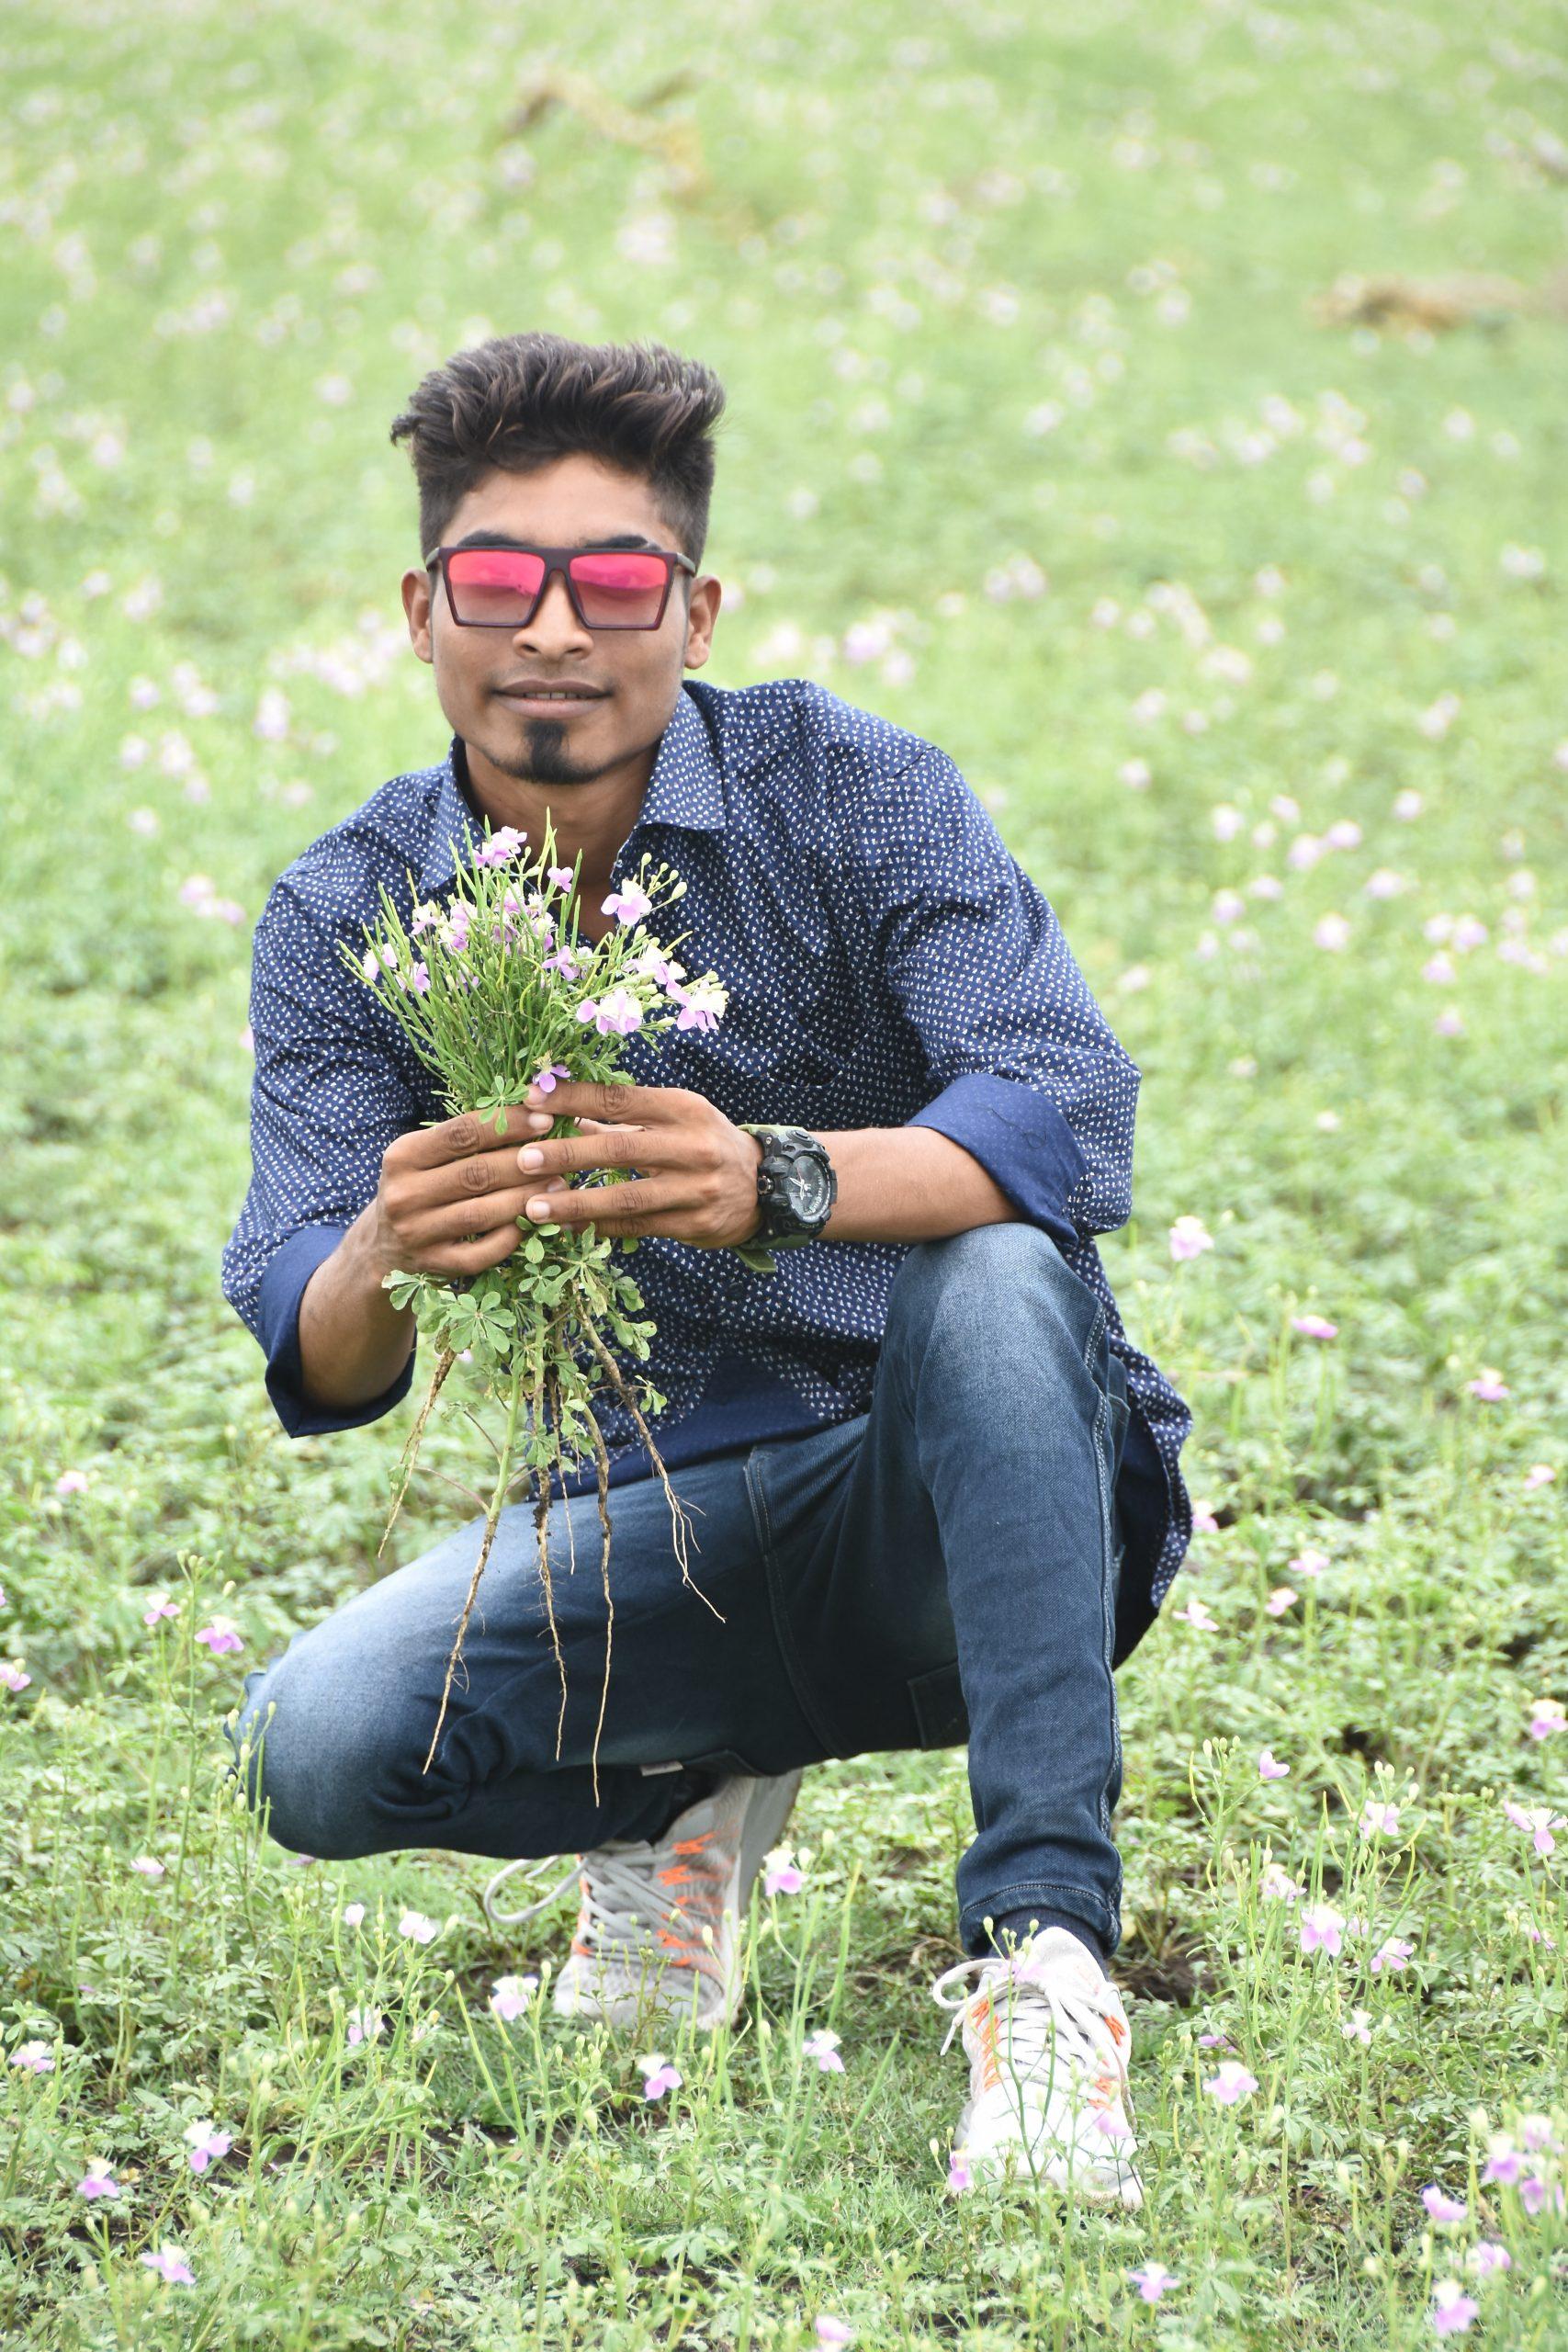 Boy posing with flowers in farm